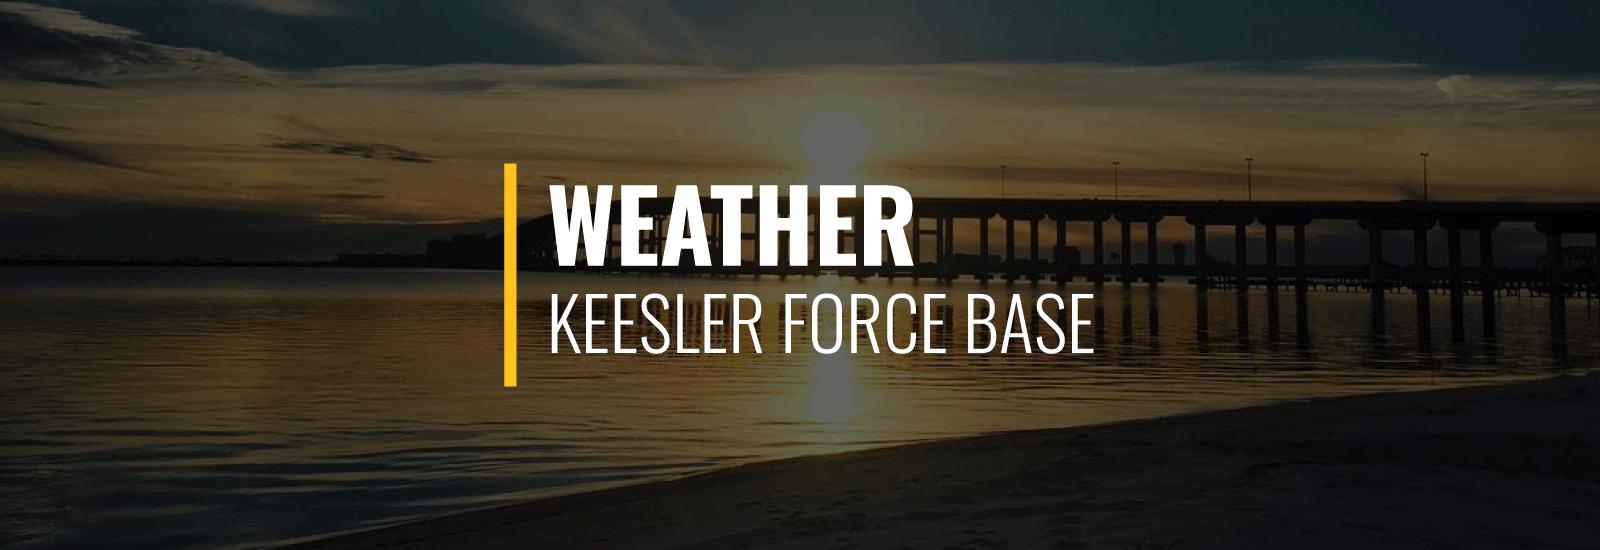 Weather Keesler AFB